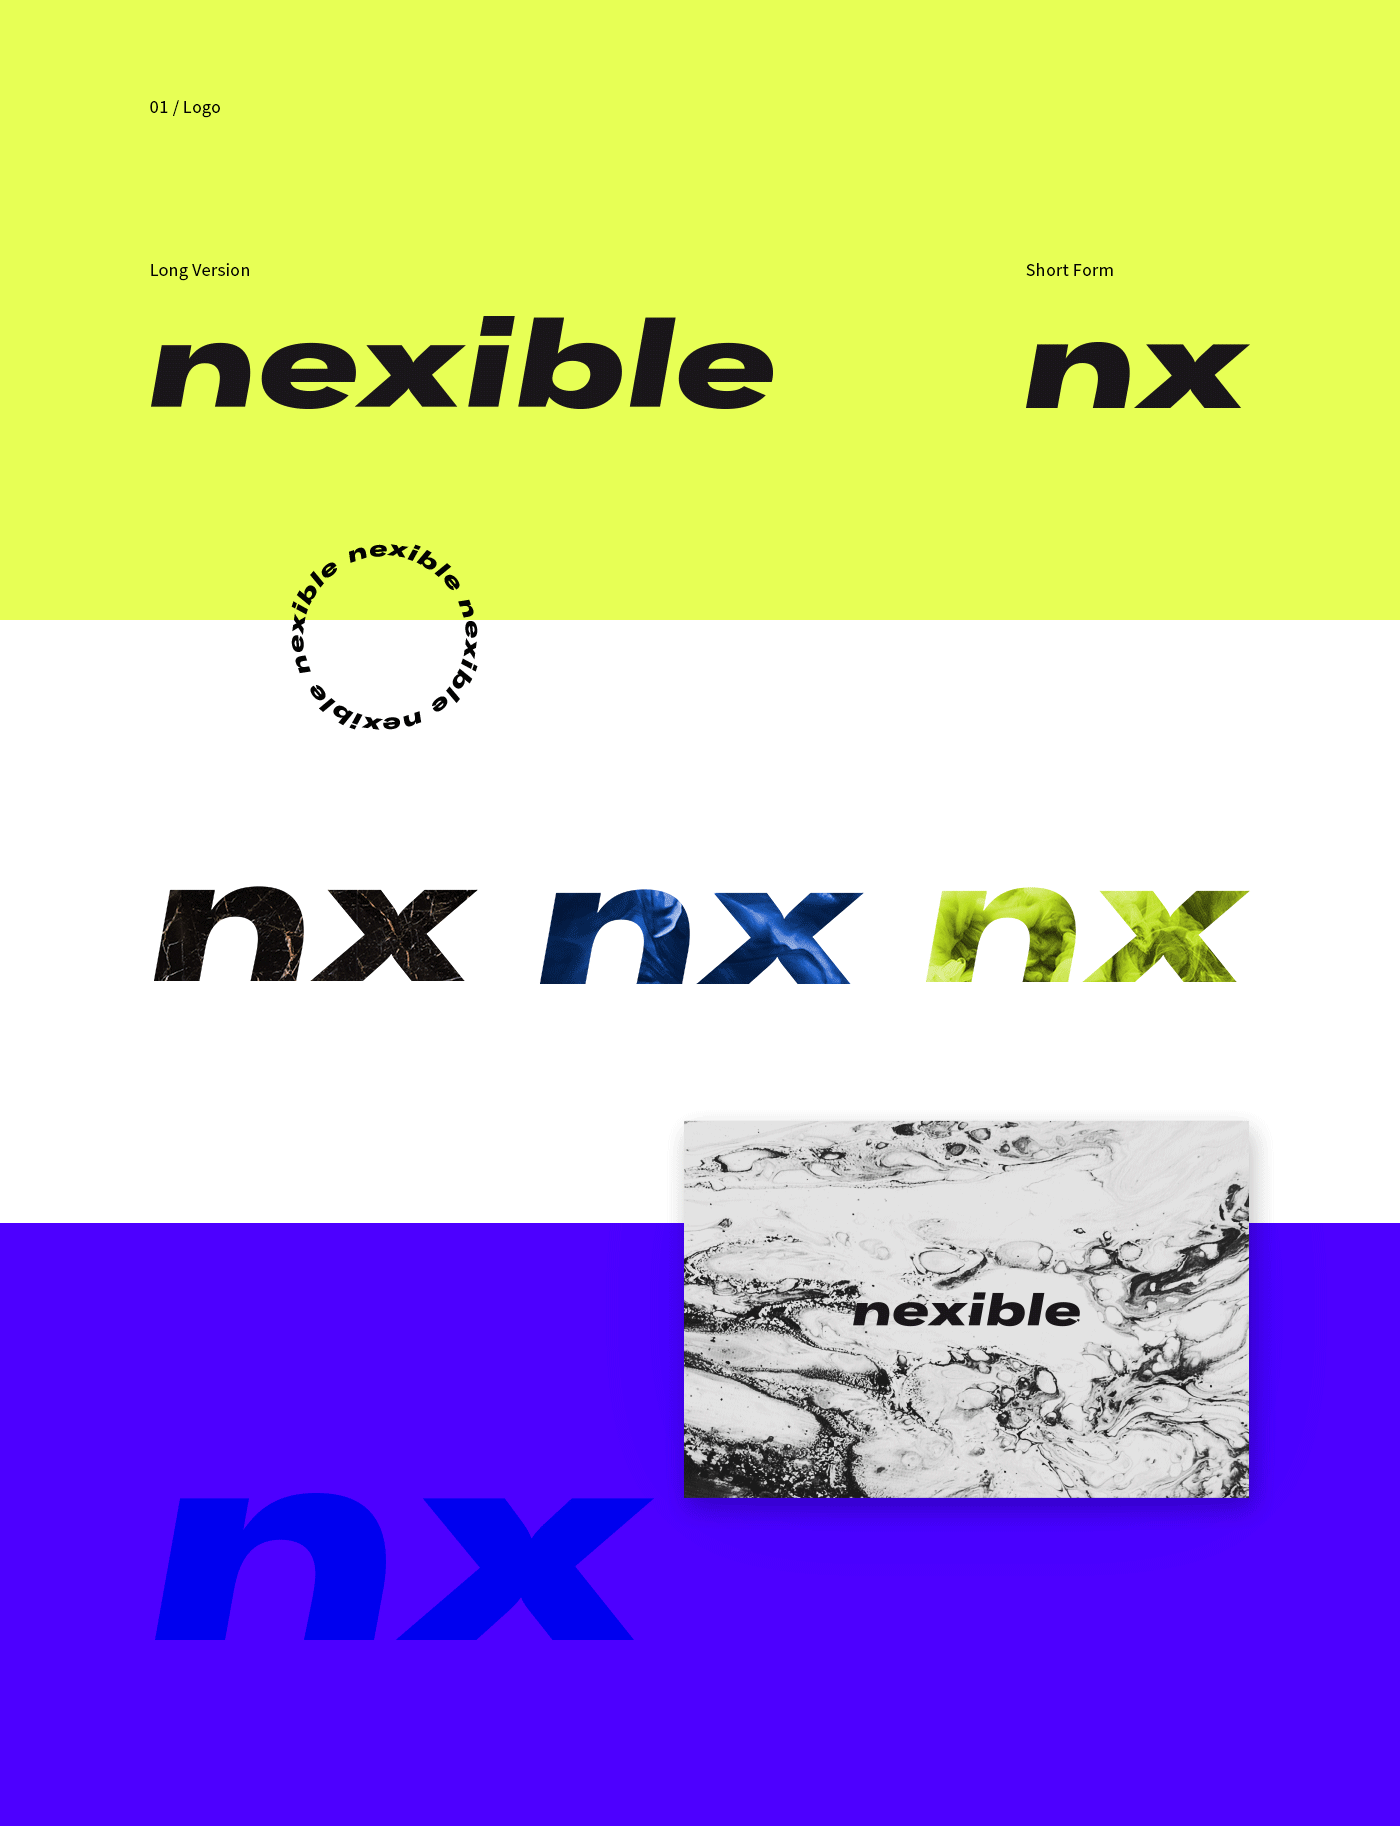 branding-nexible-onogrit-02.png